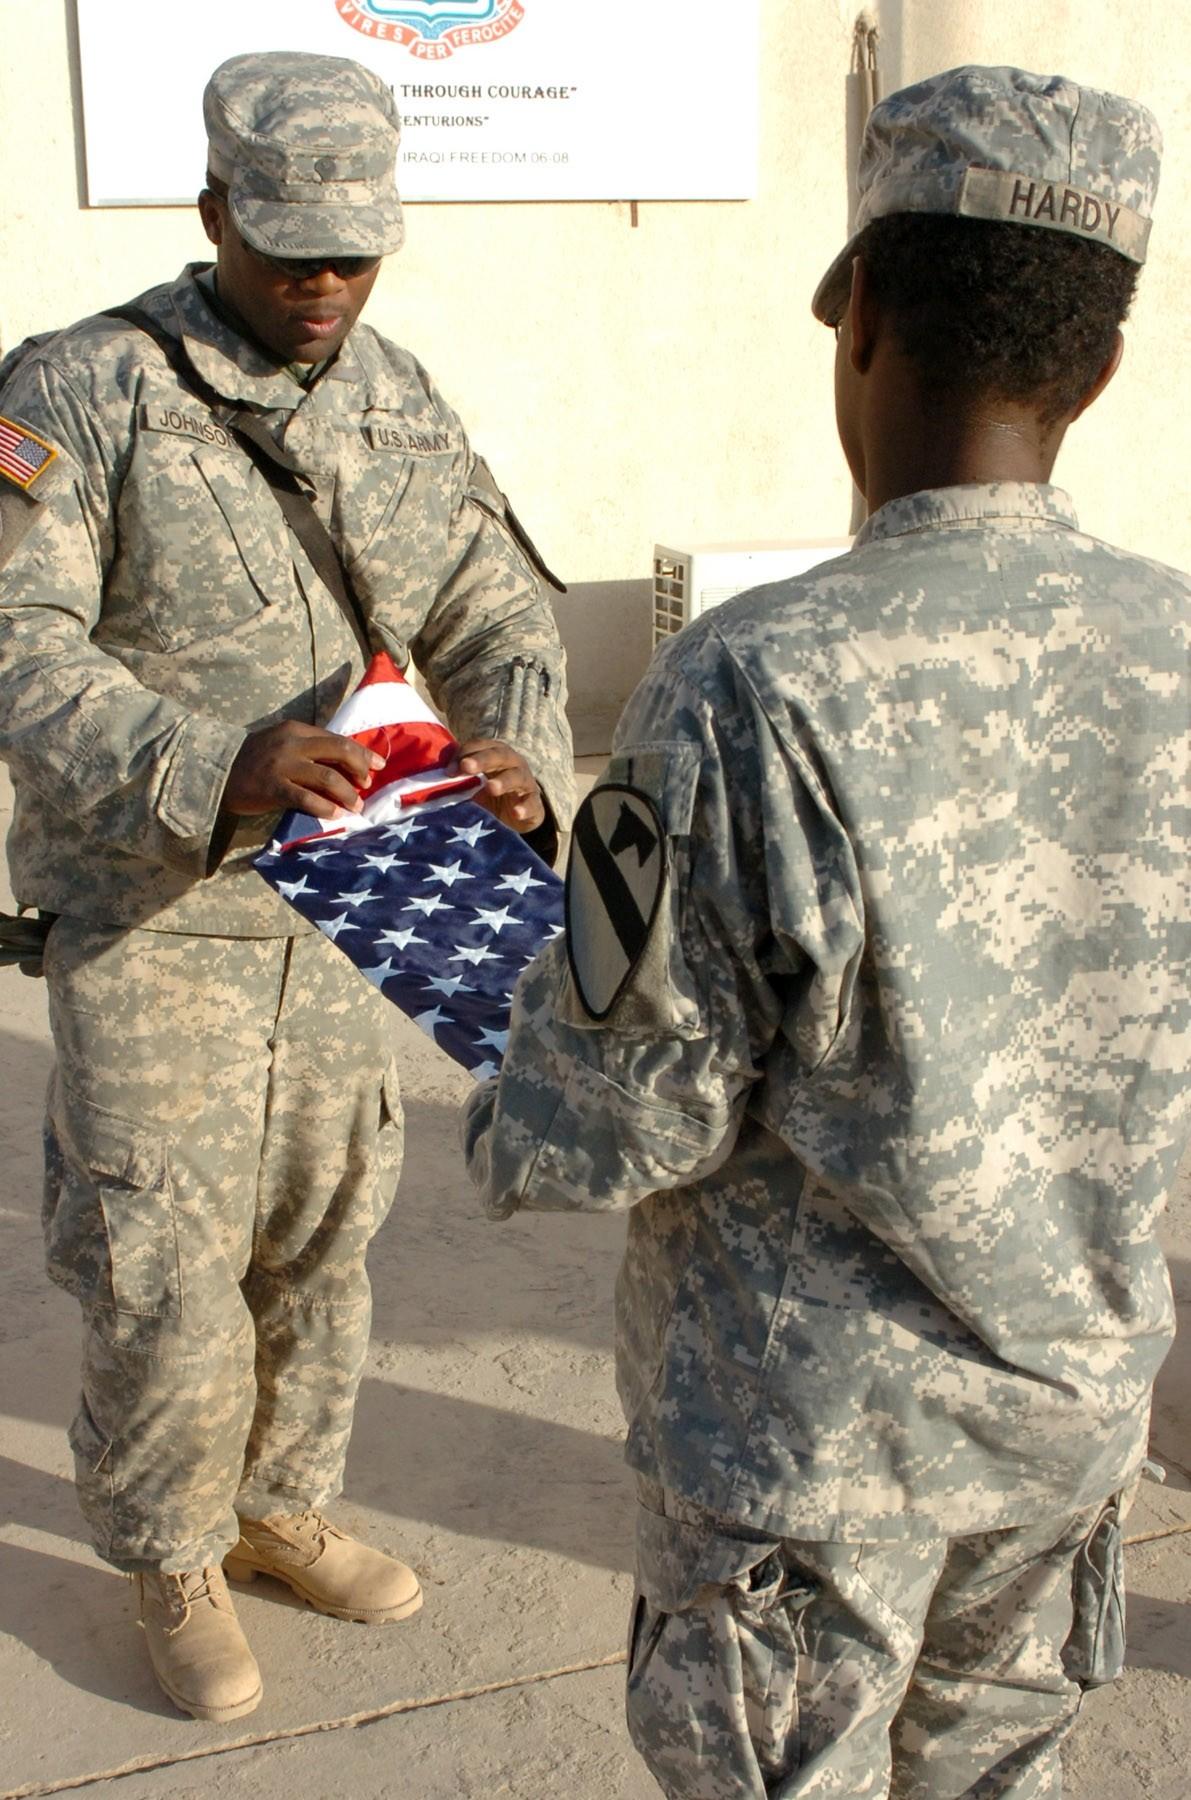 Ironhorse Brigade troopers unfurl gift flags during